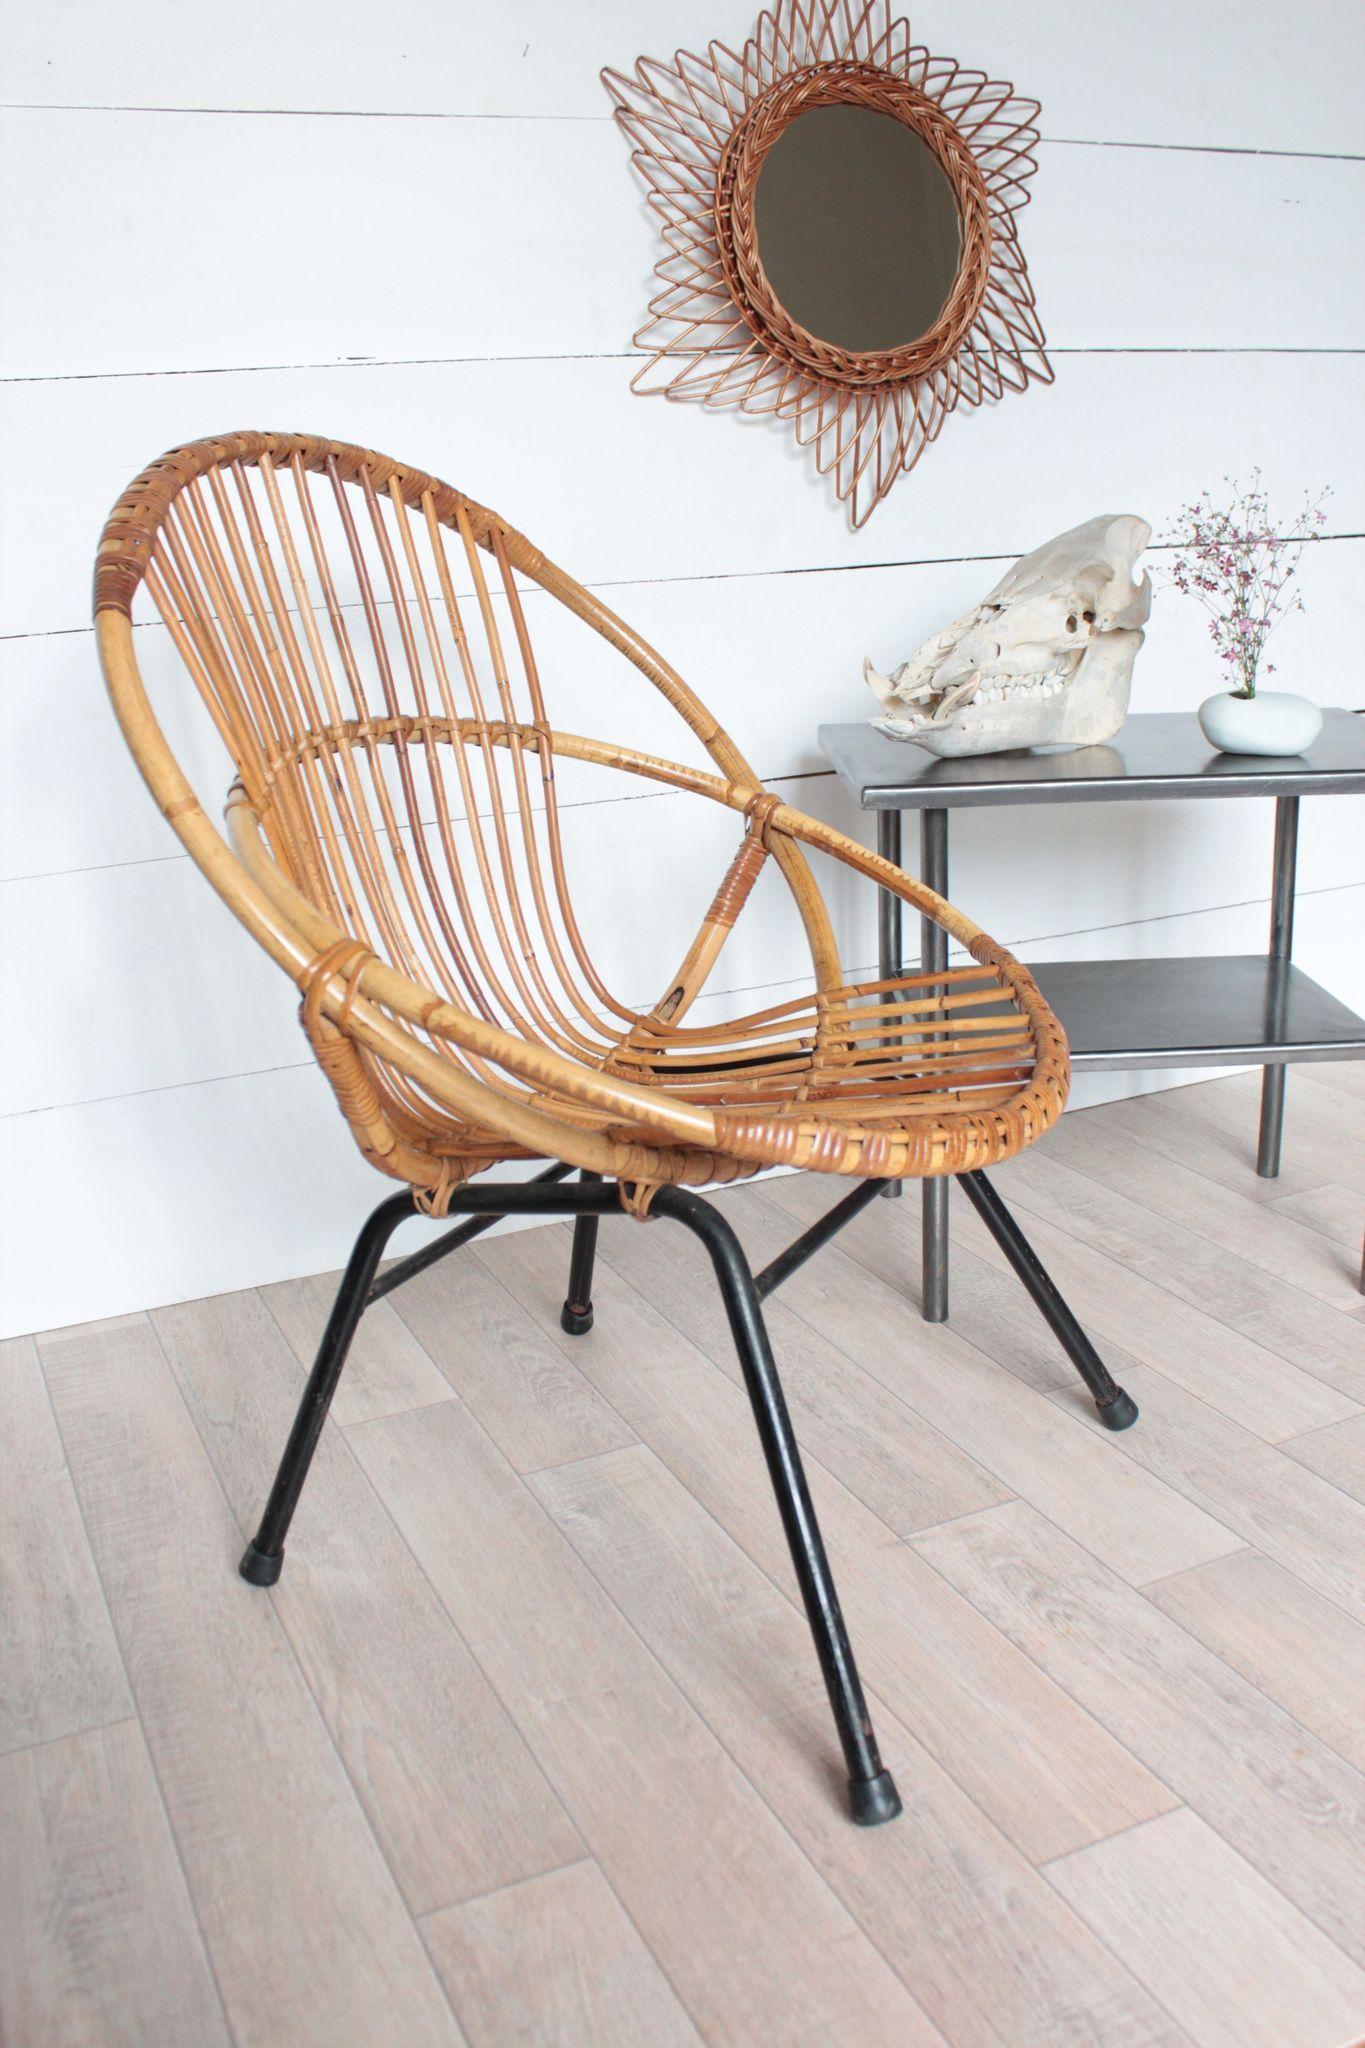 fauteuil coquille vintage en rotin adulte Trendy Little 1